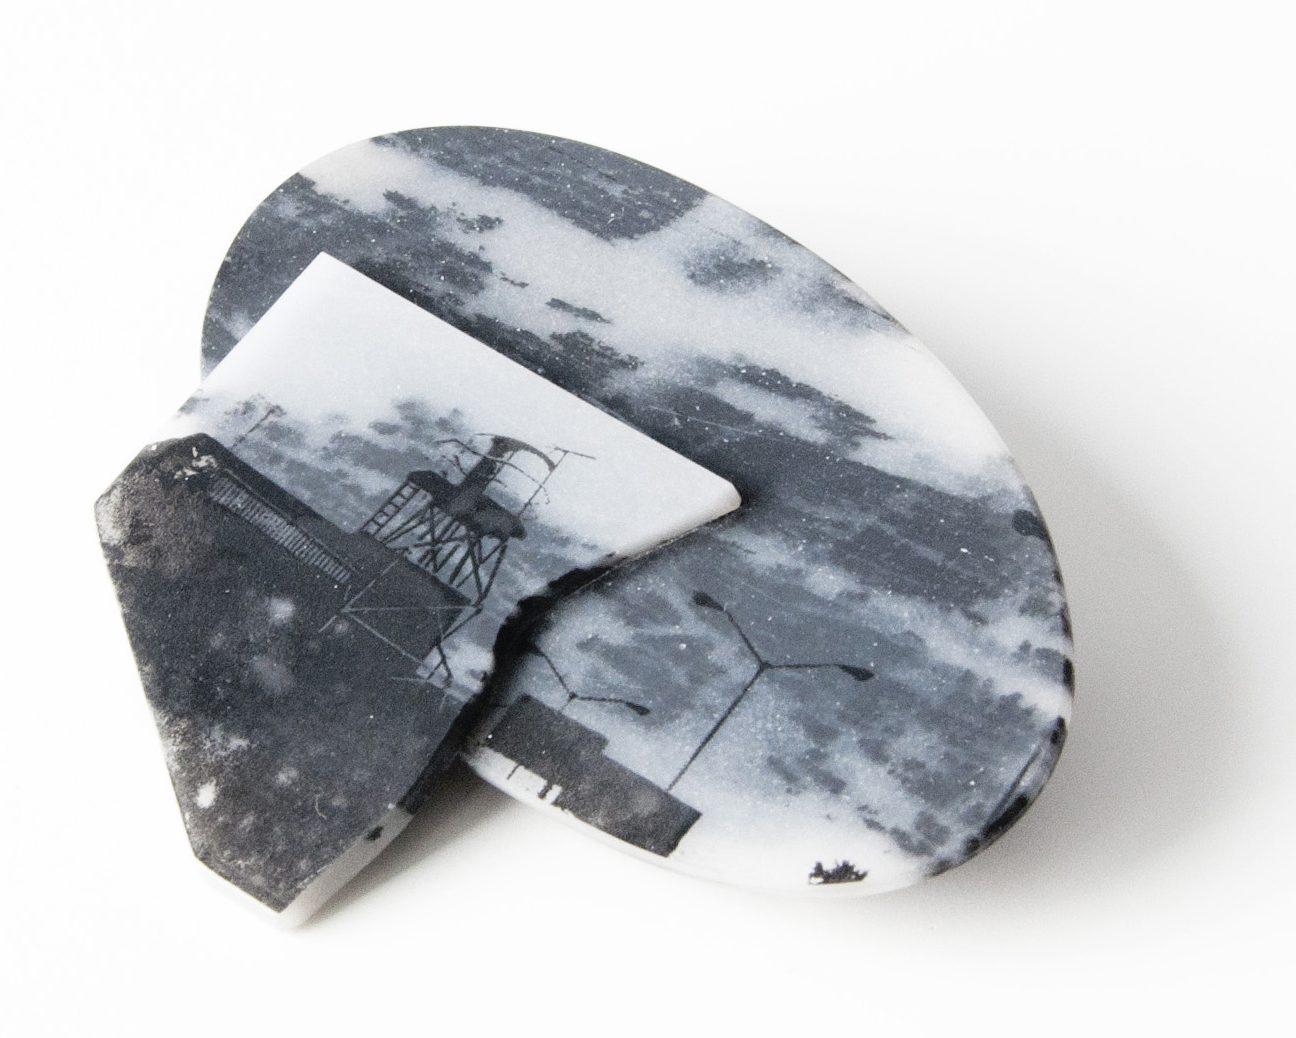 Alejandra Solar, Camuflage, broche, 2017, zilver